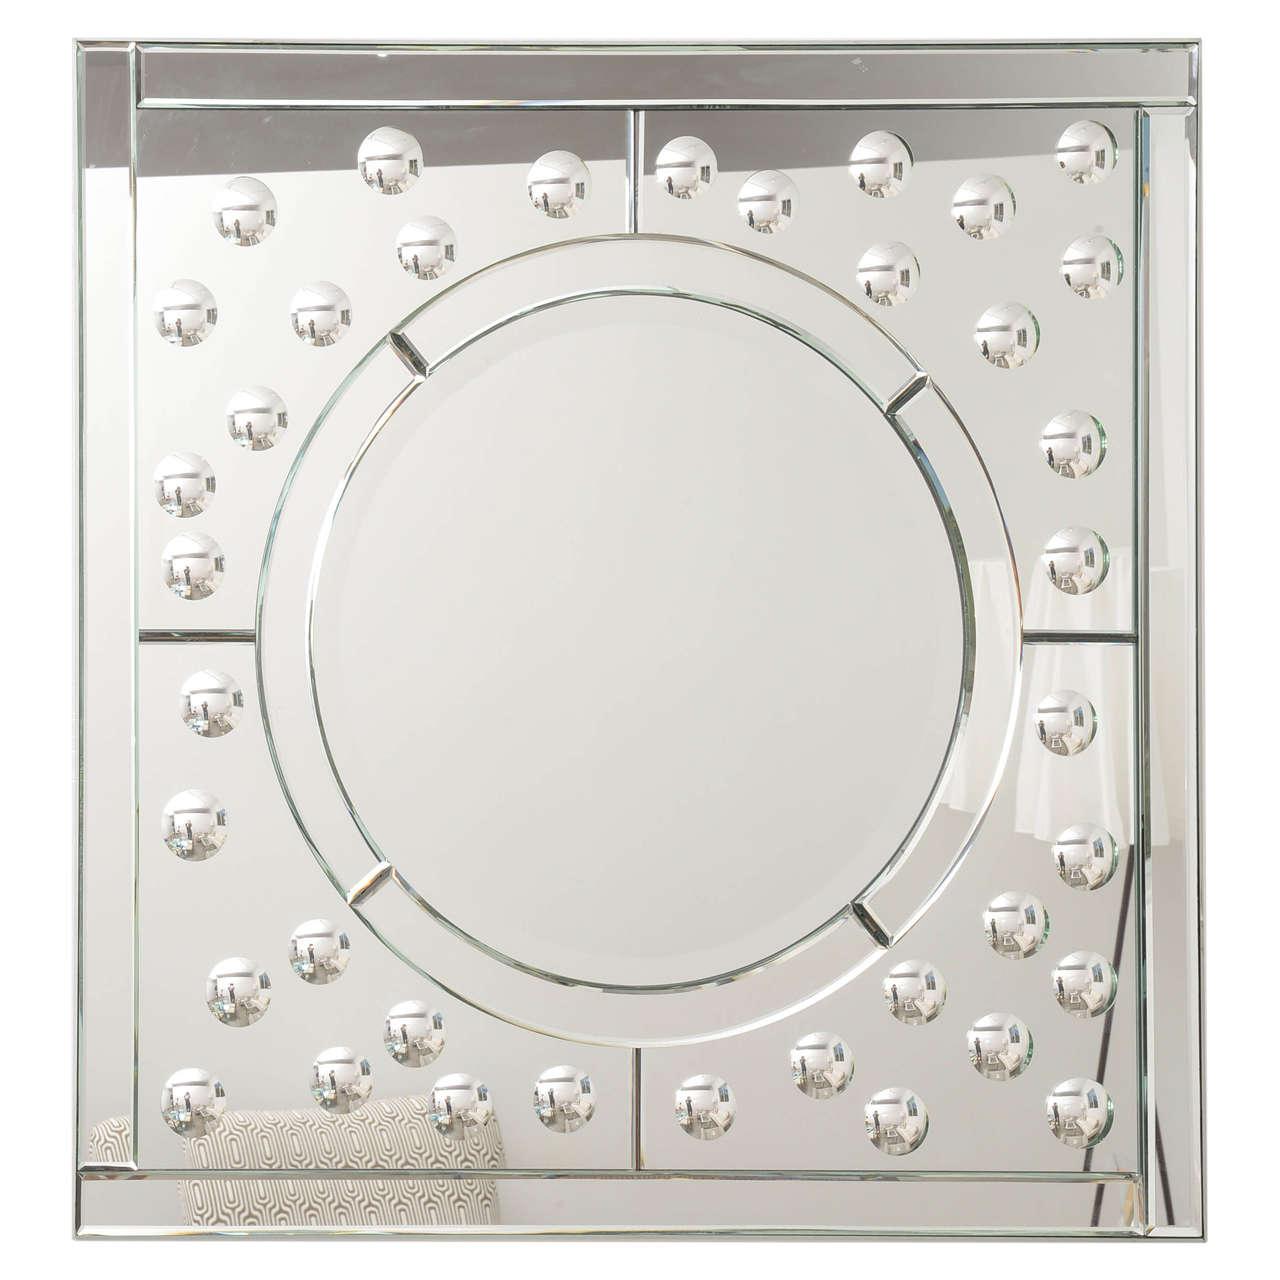 Square Mirror with Bullseye Motif